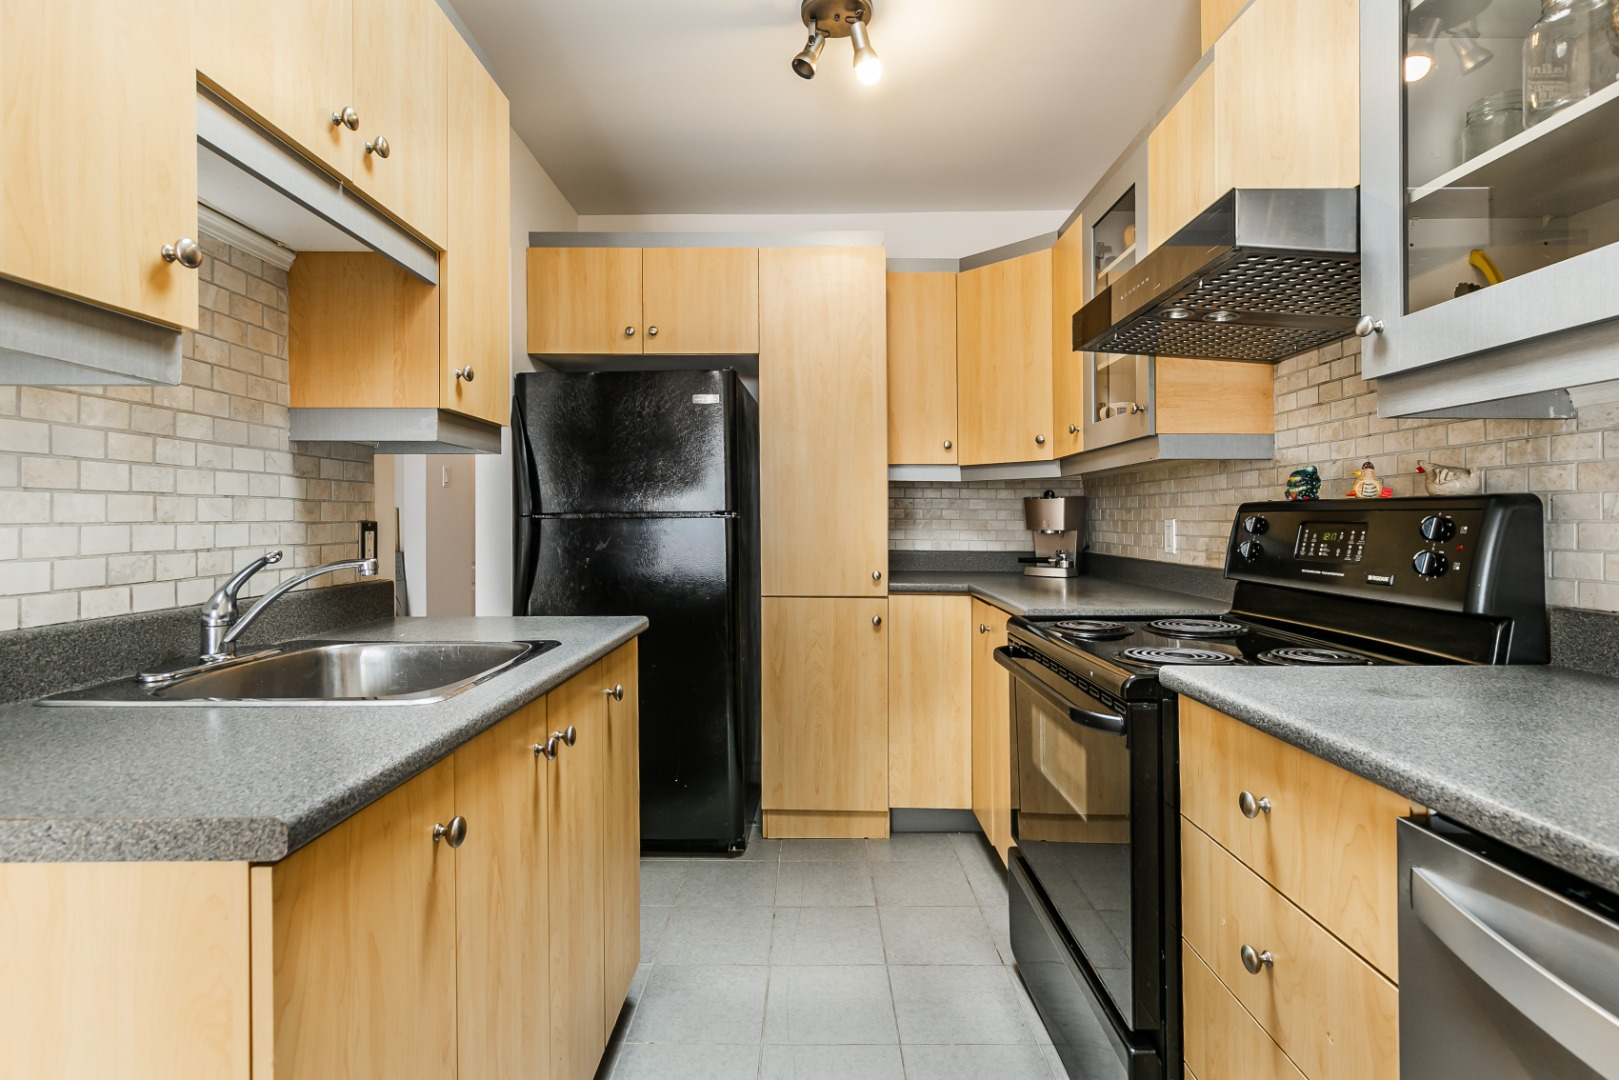 Condo à vendre Villeray 7547 Rue Lajeunesse (8).jpg